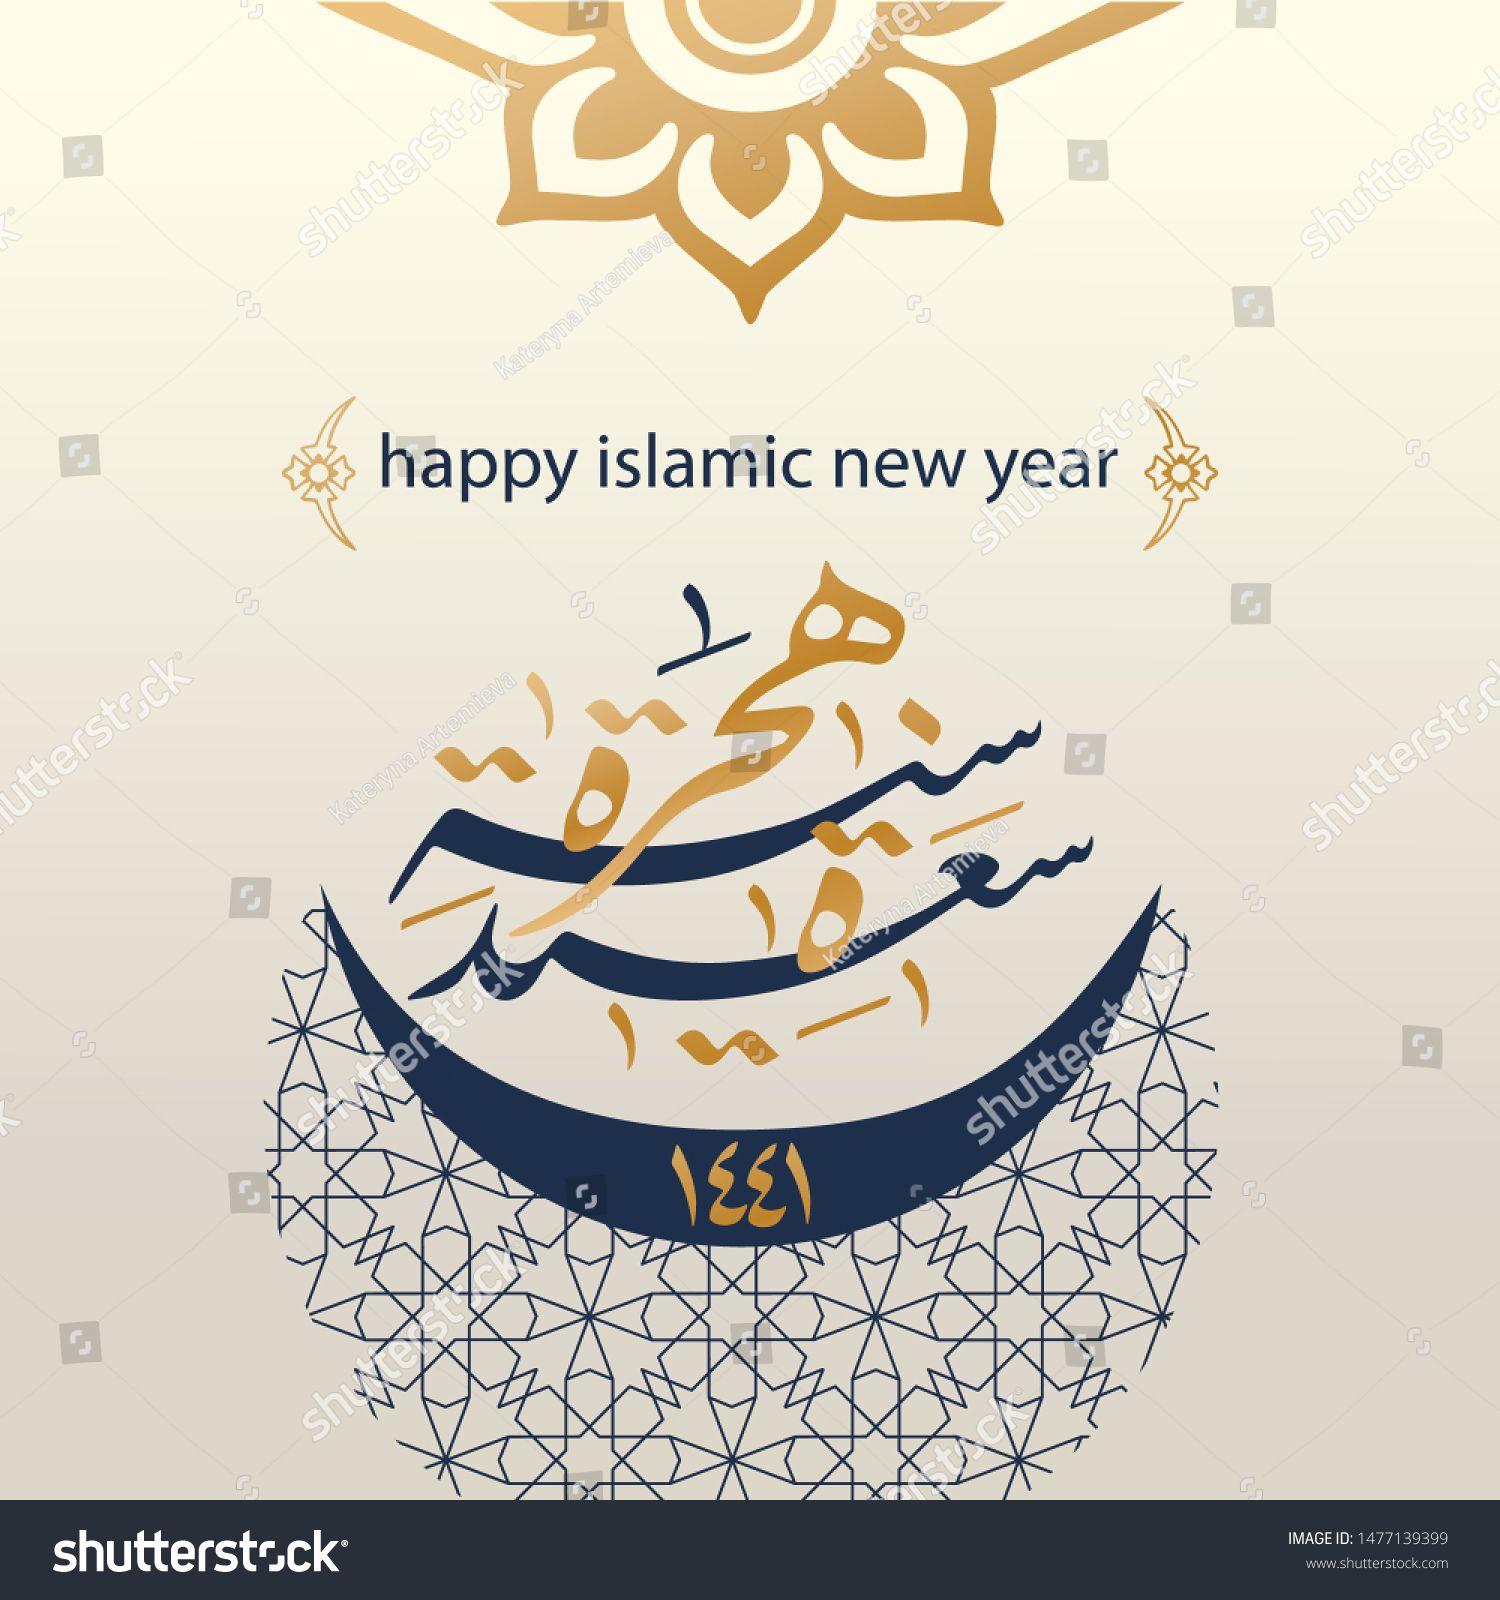 islamic happy new year 2020